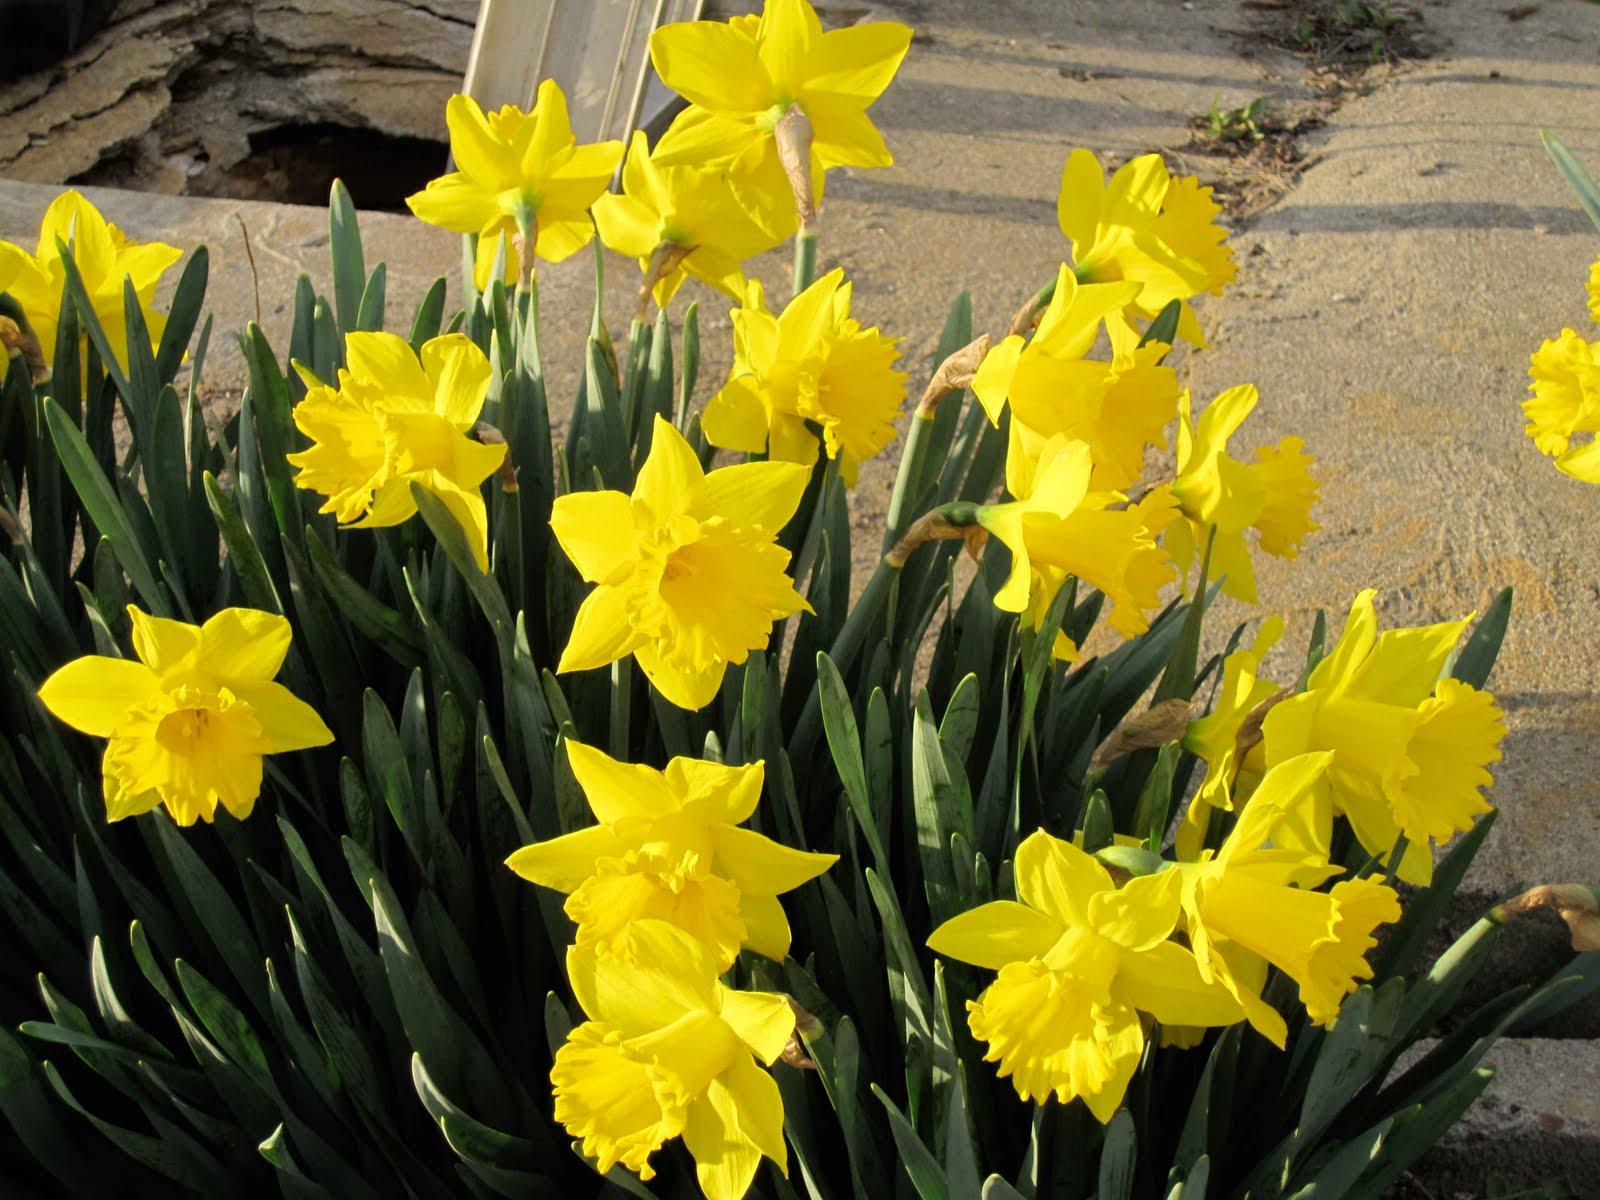 cwaux: Gentle Daffodils in Spring HD Wallpaper